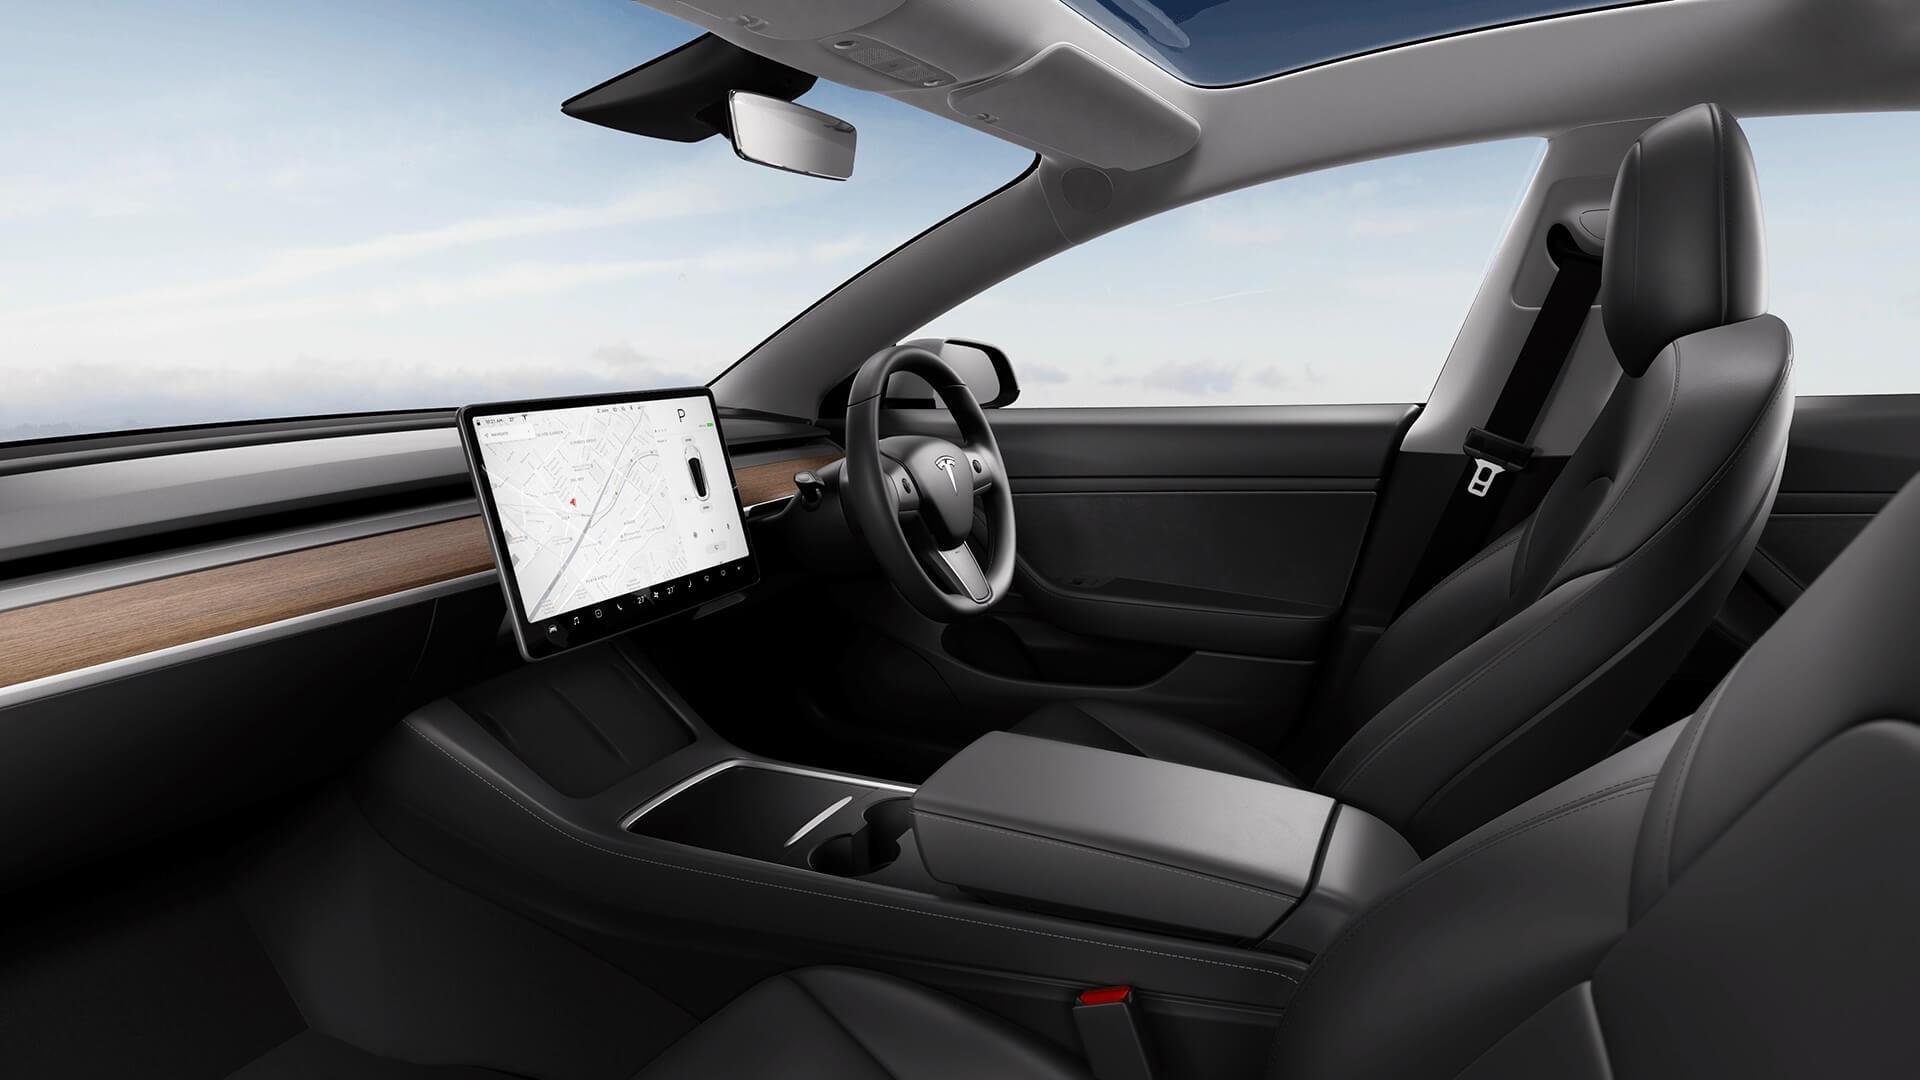 2021 Tesla Model 3 interieur dashboard